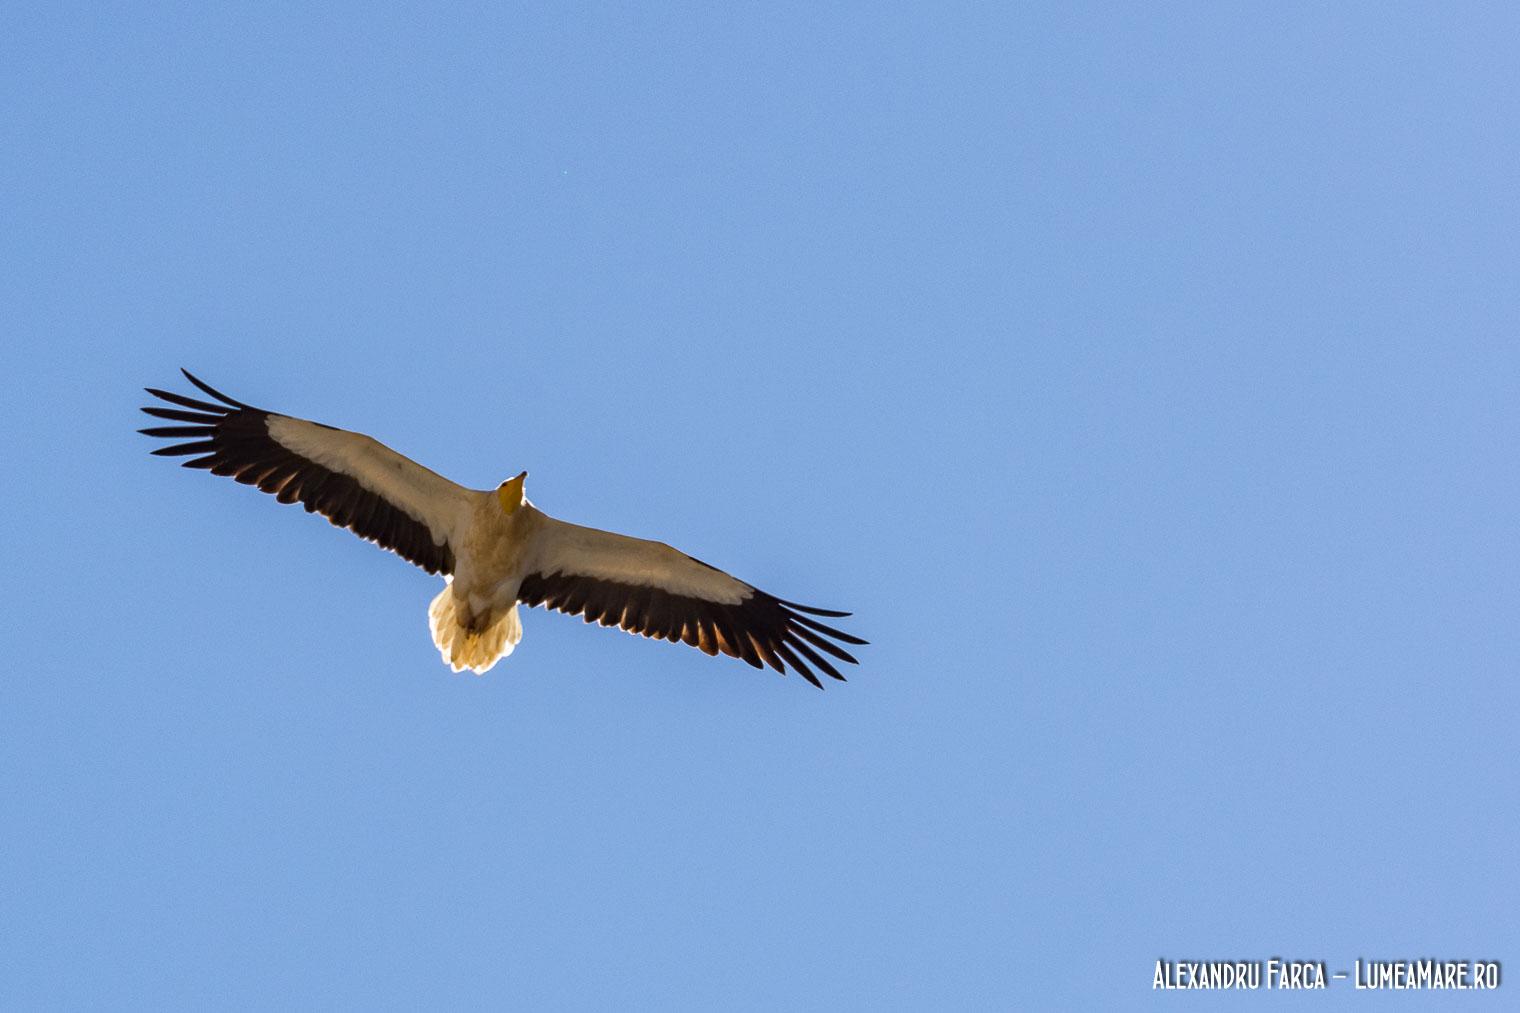 Vulturii egipteni zboara peste Jebel Shams